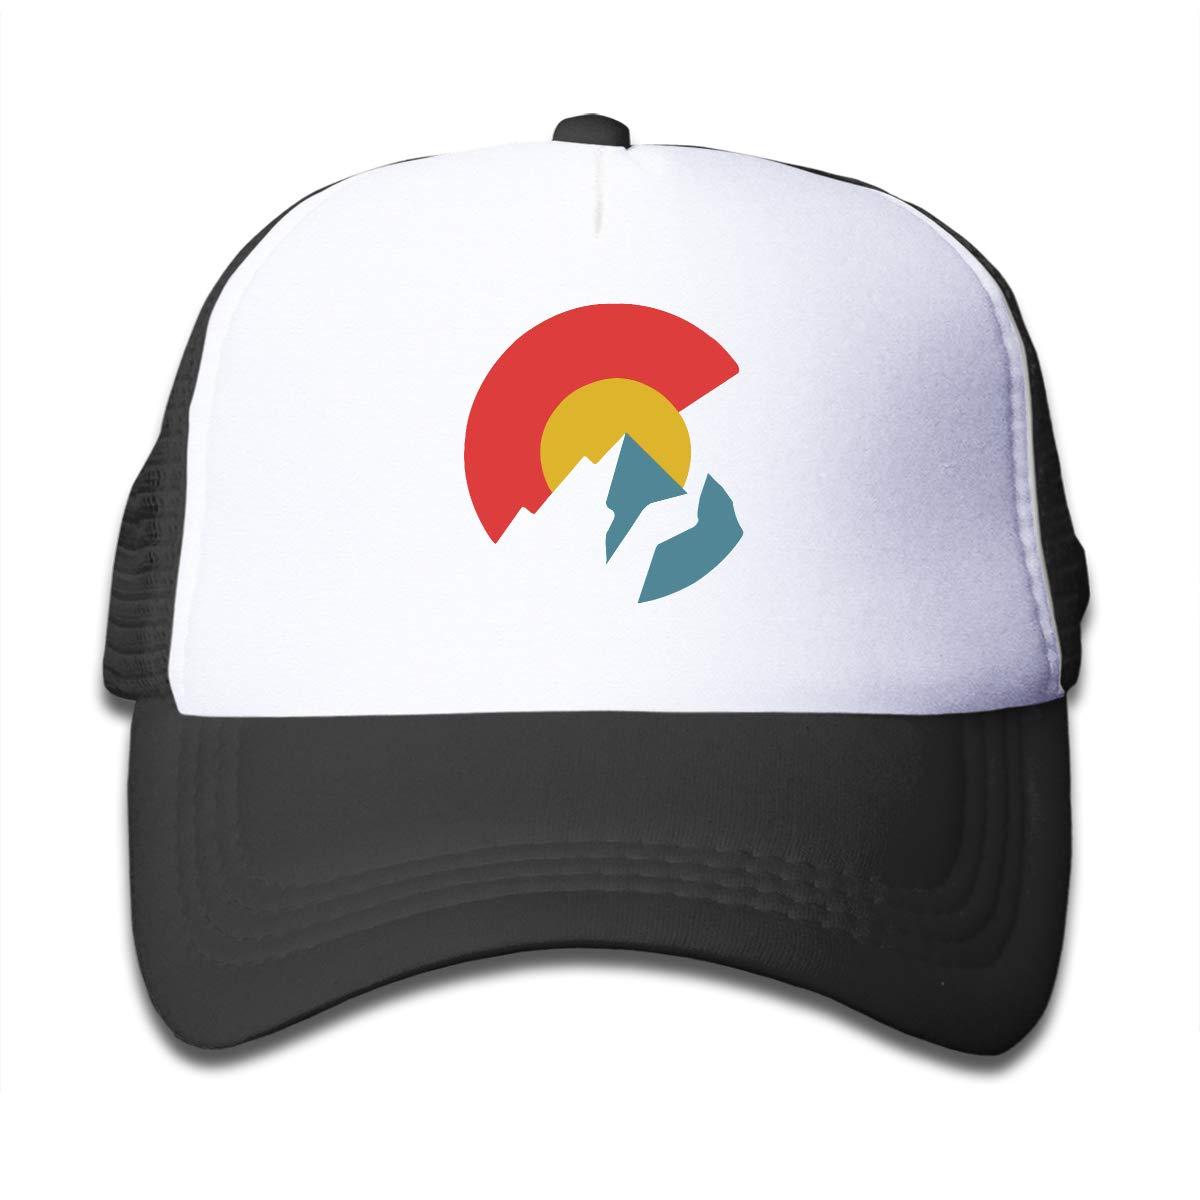 Waldeal Mountain Colorado C Kindergarten Cool Baseball Cap Truck Driver Net Cap Suitable for Children